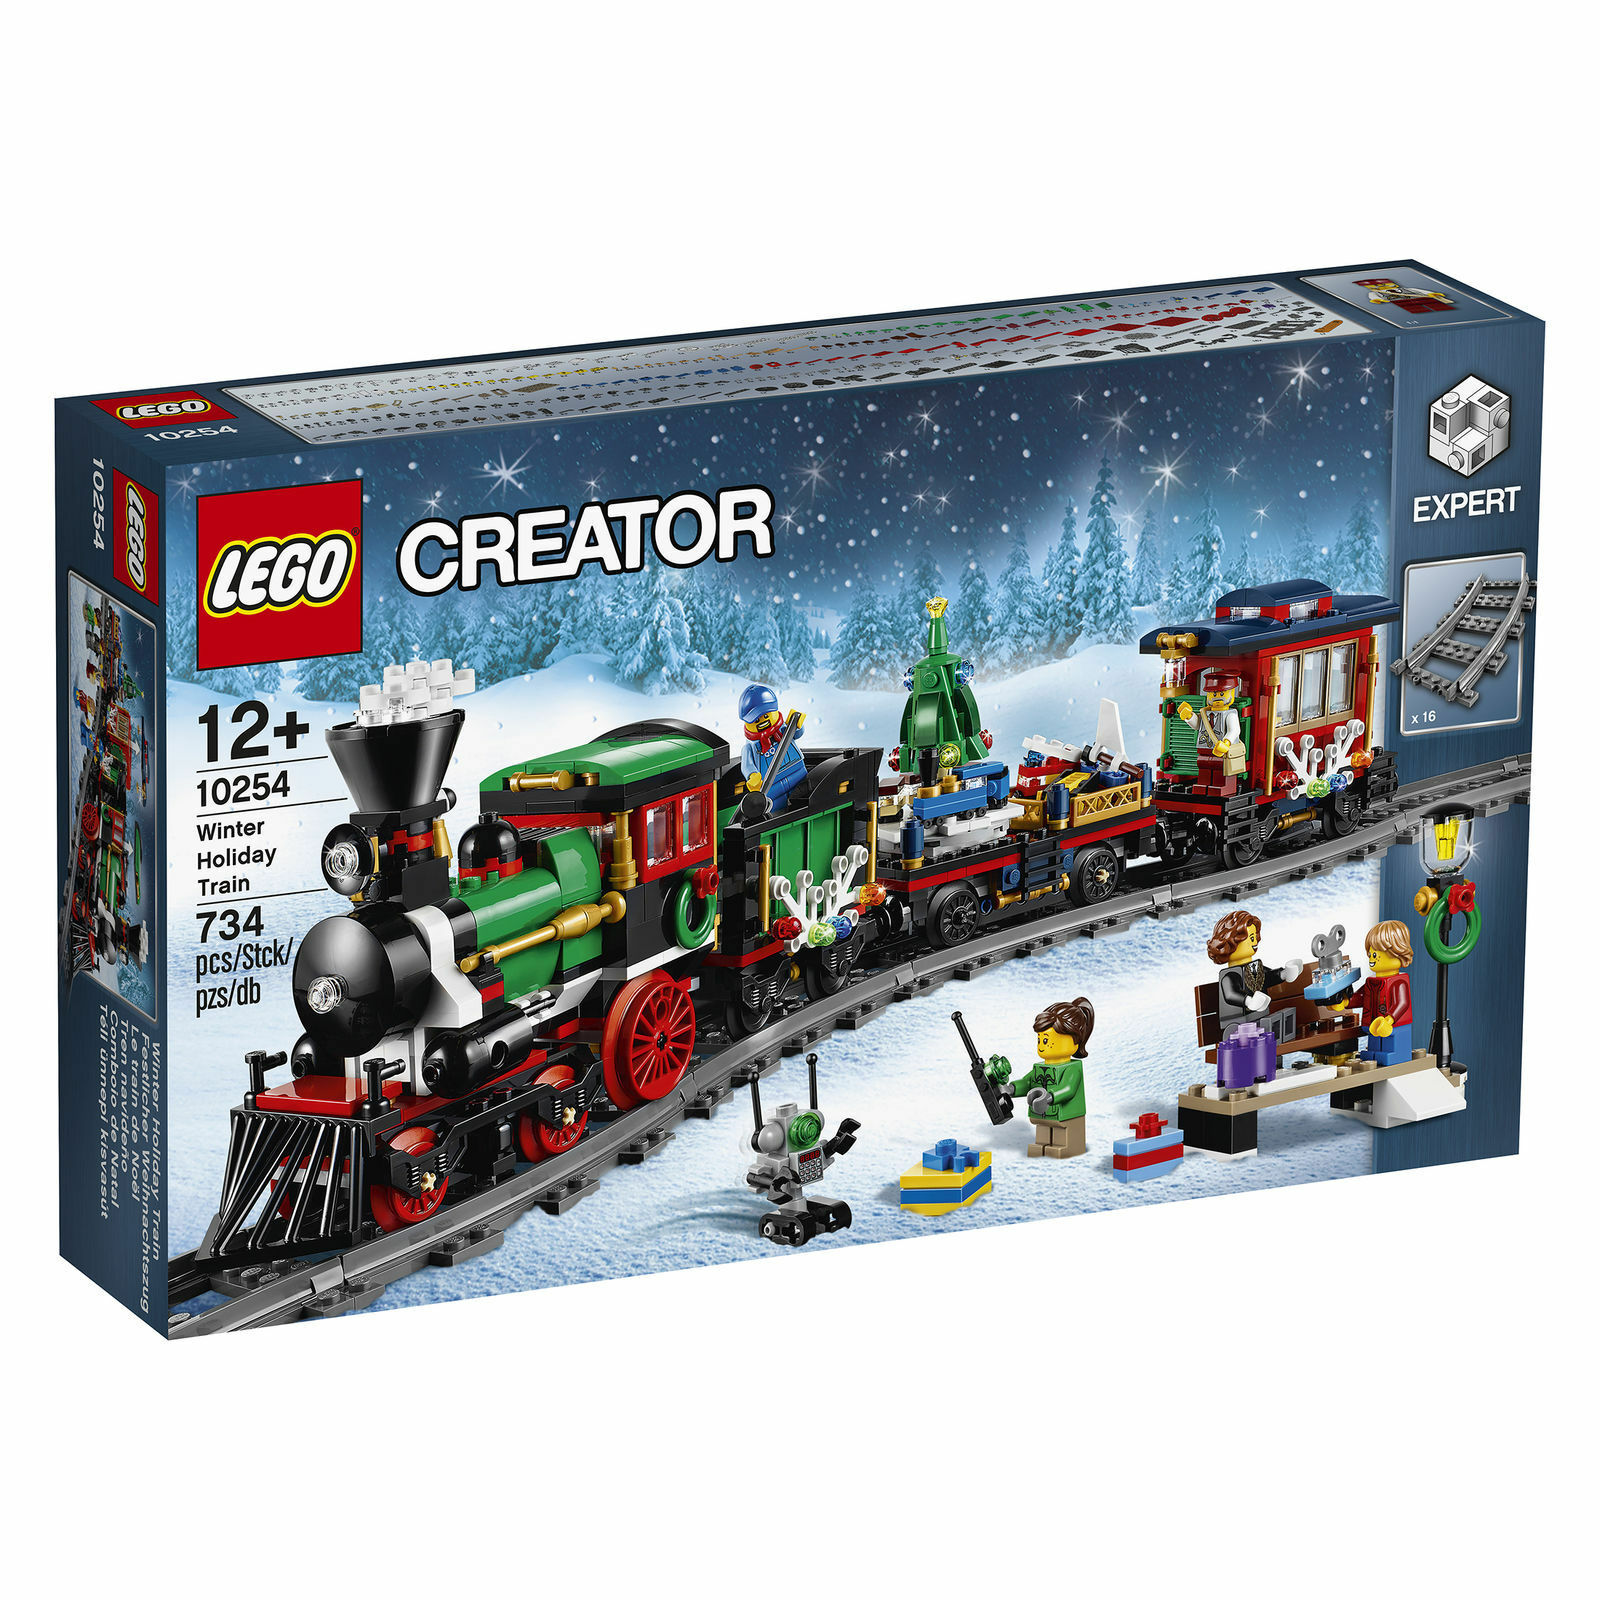 NUOVO LEGO 10254 Creator: luccicante weihnachtszug 6667212